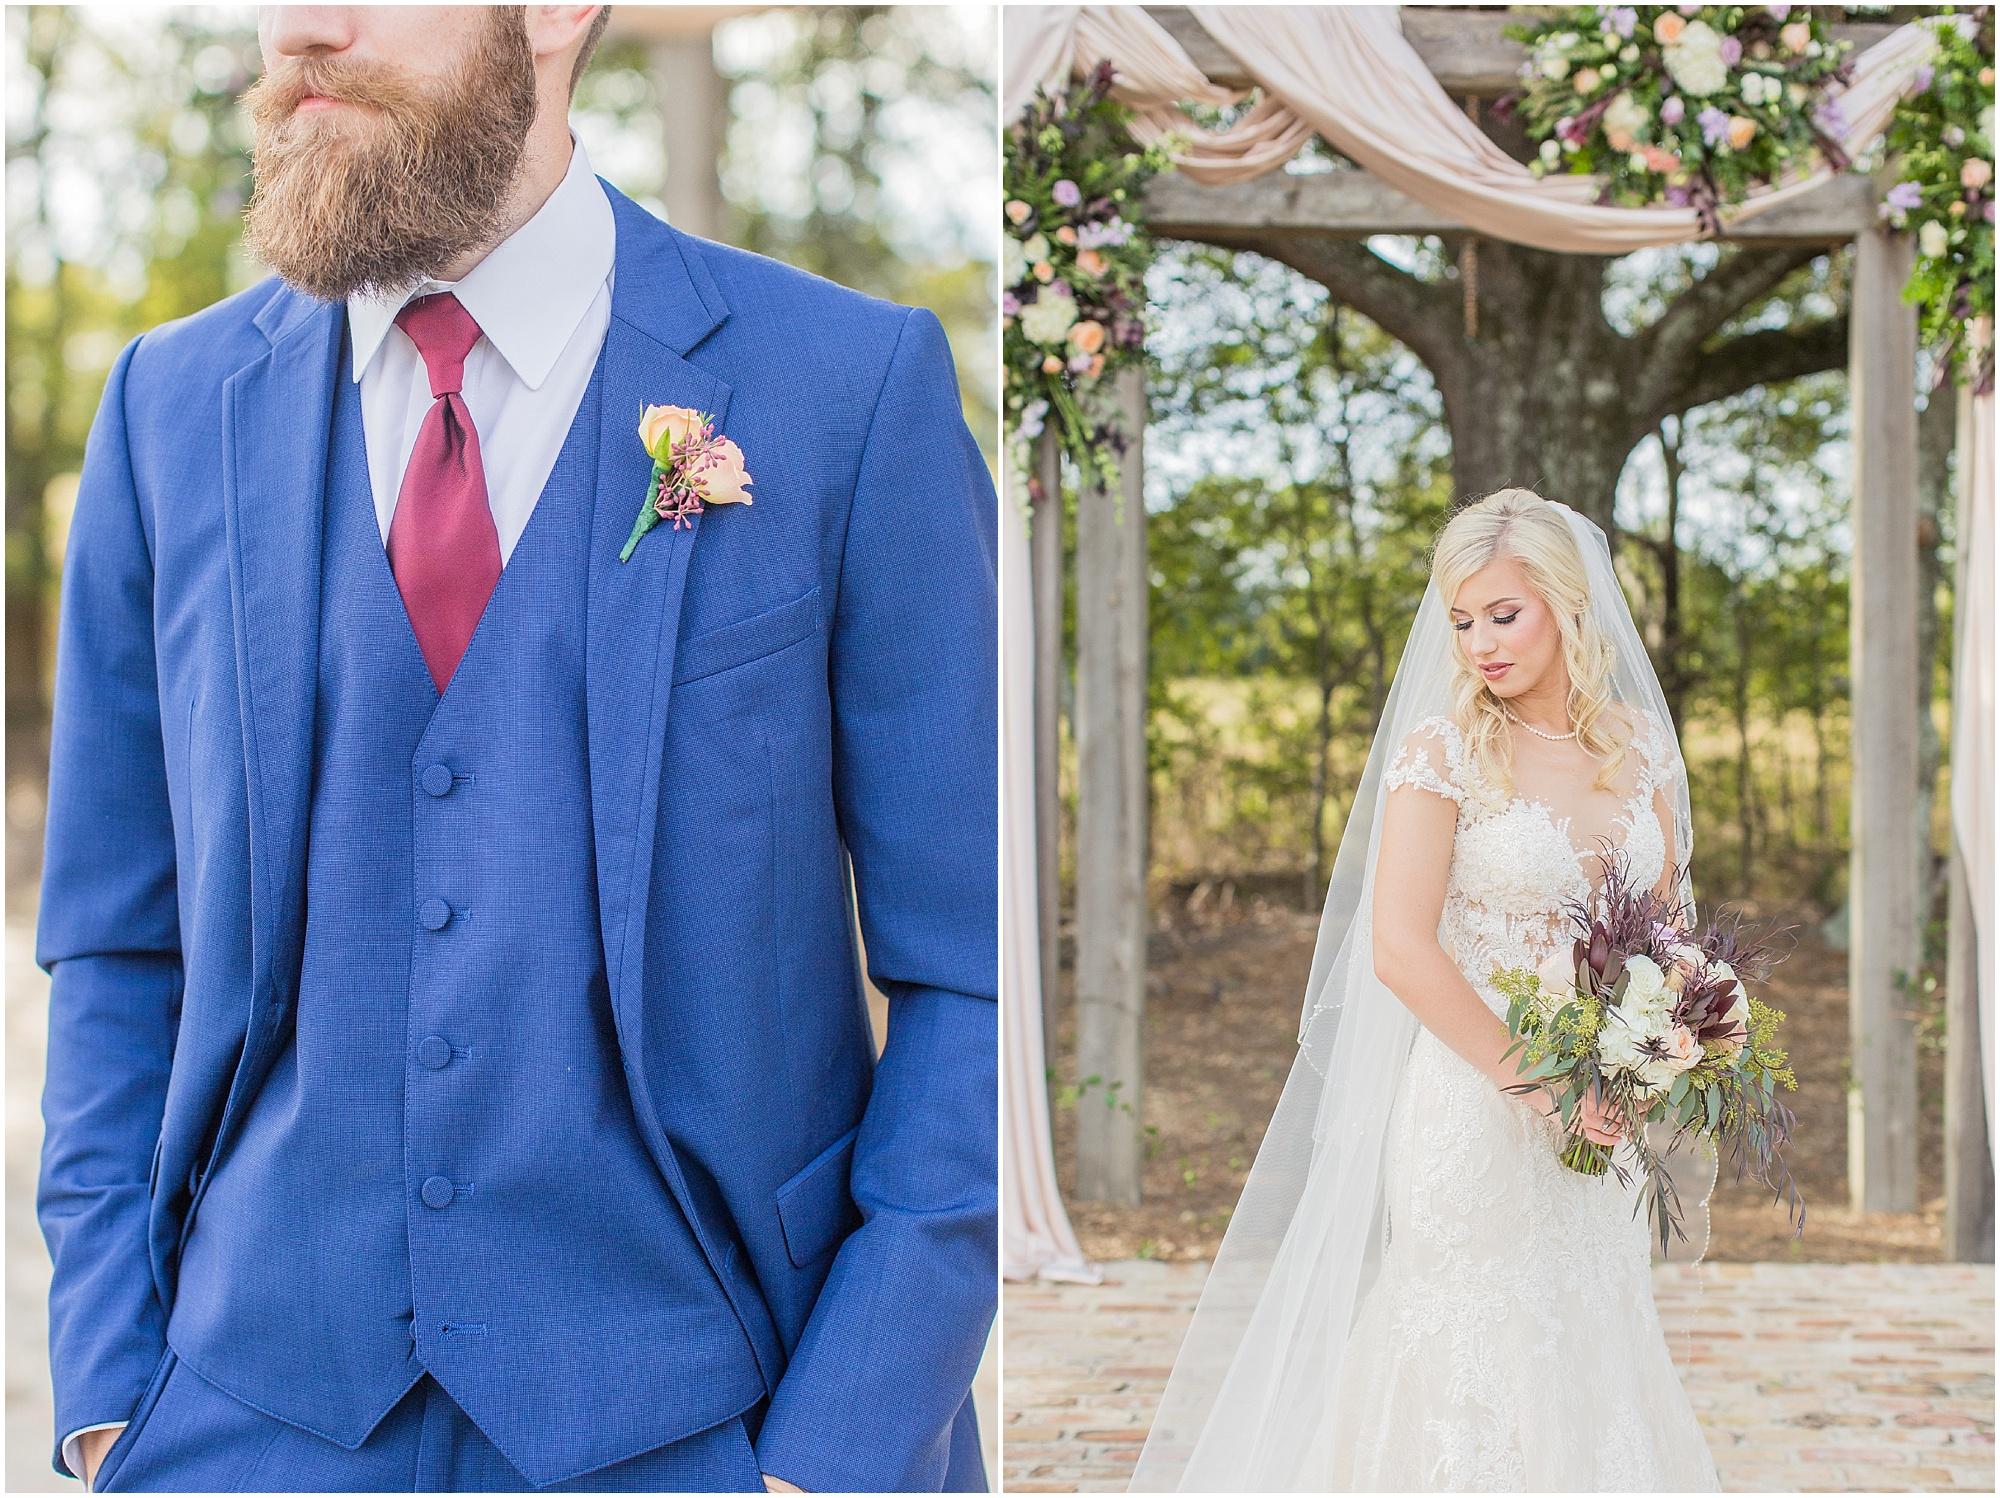 fall-wedding-bridlewood-of-madison-mississippi_0025.jpg